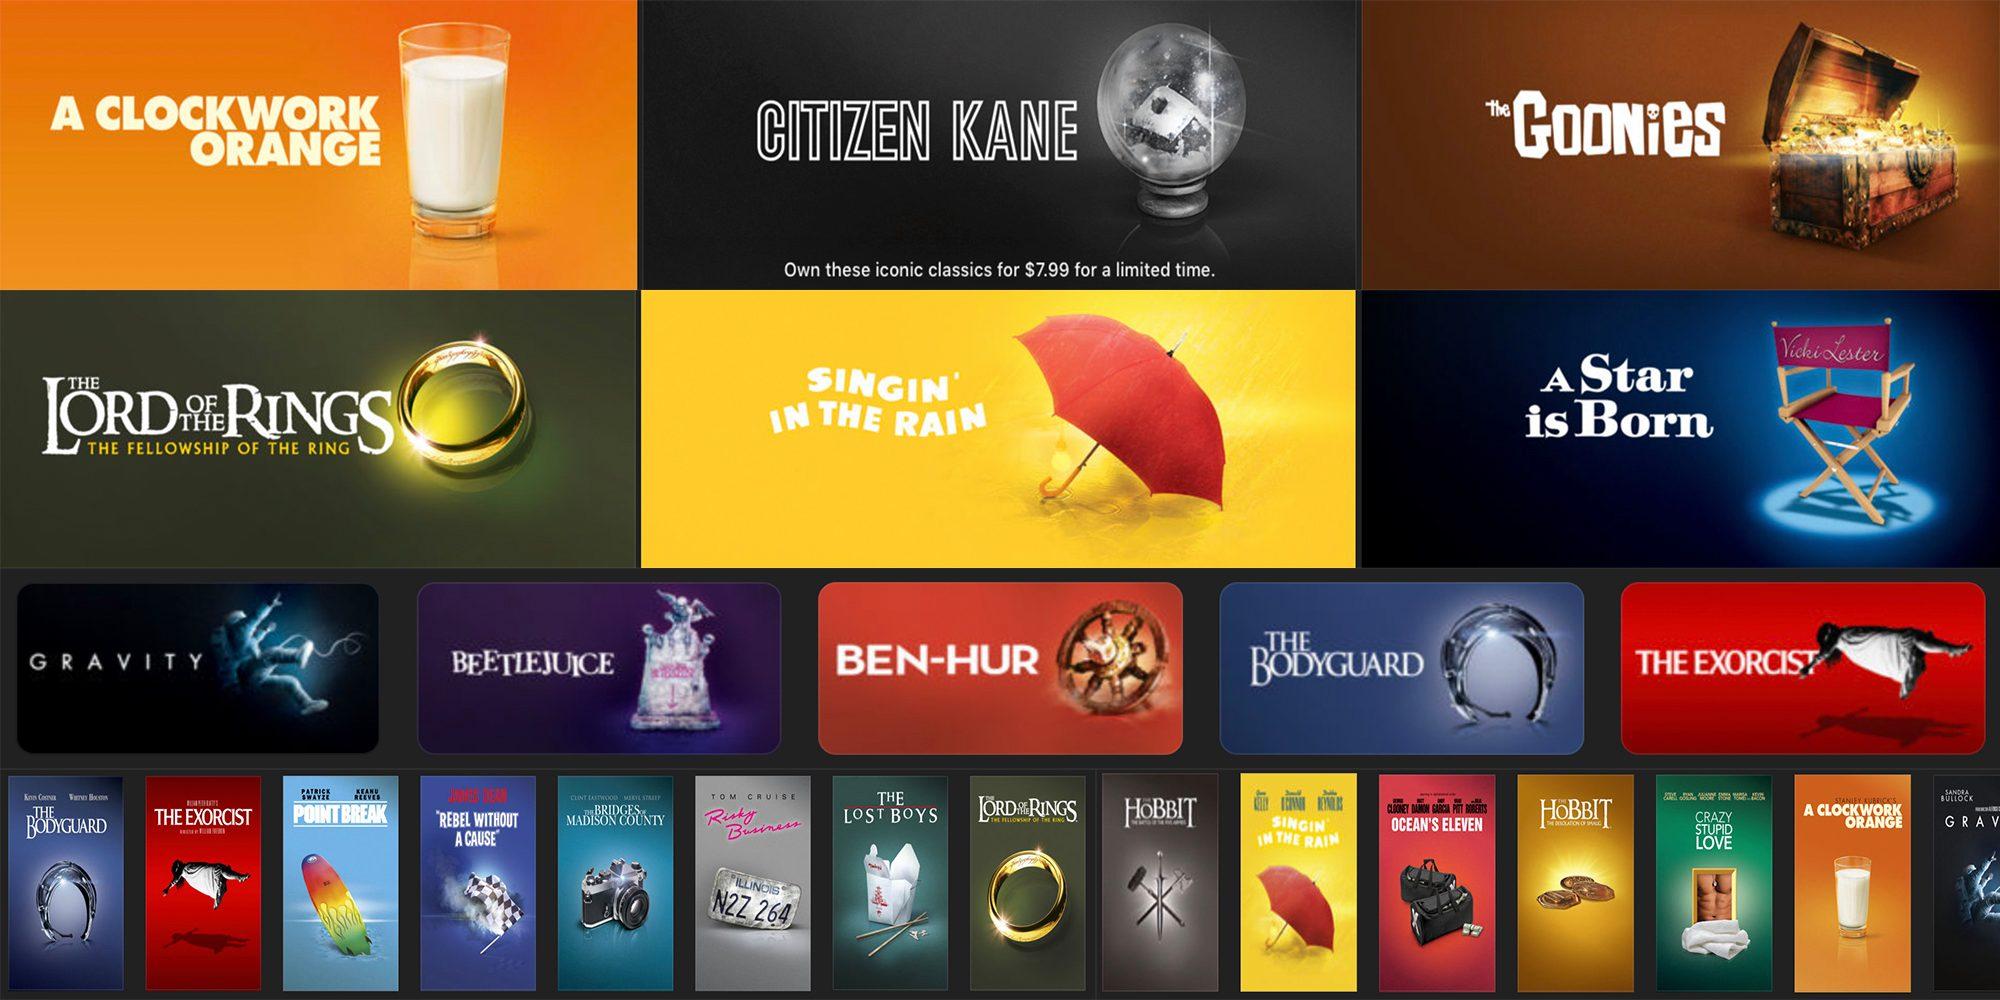 This week's best iTunes movie deals: $8 Essentials sale, 4K from $5, Tomb Raider $1, more